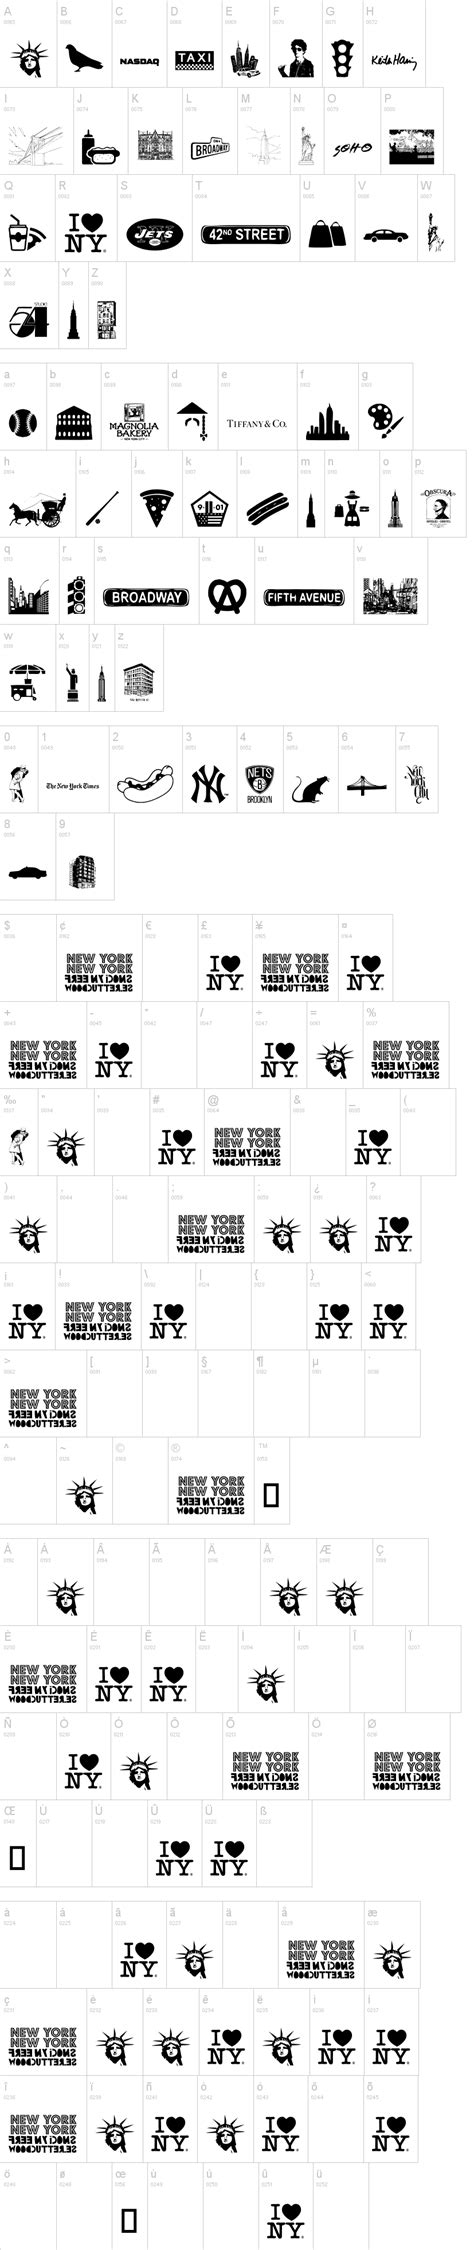 dafont new new york new york 1 font dafont com